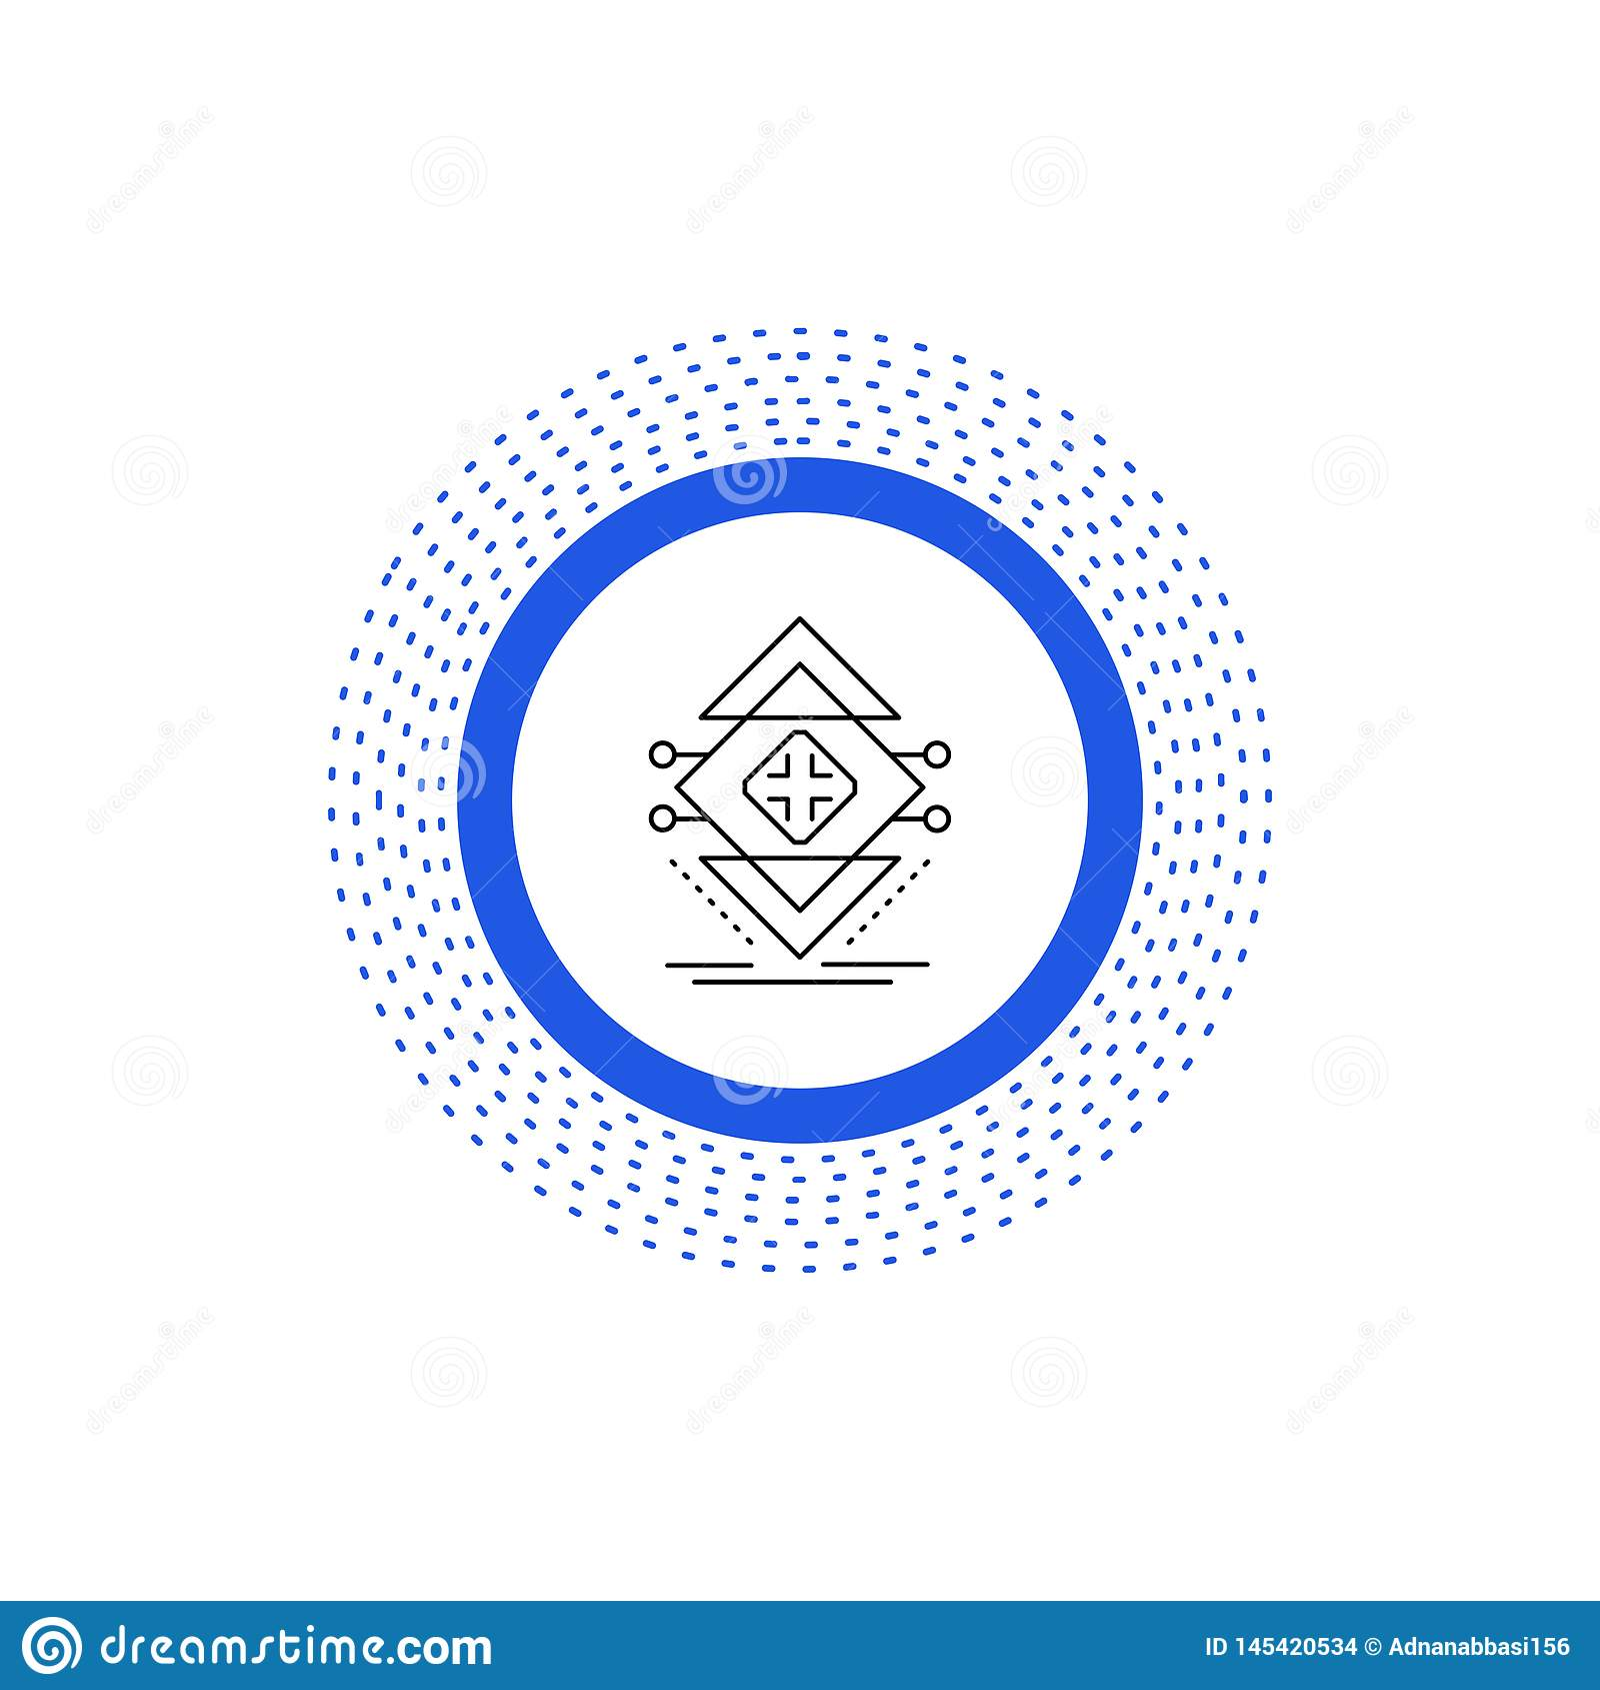 Ber?kna data, infrastruktur, vetenskap, strukturlinje symbol Vektor isolerad illustration